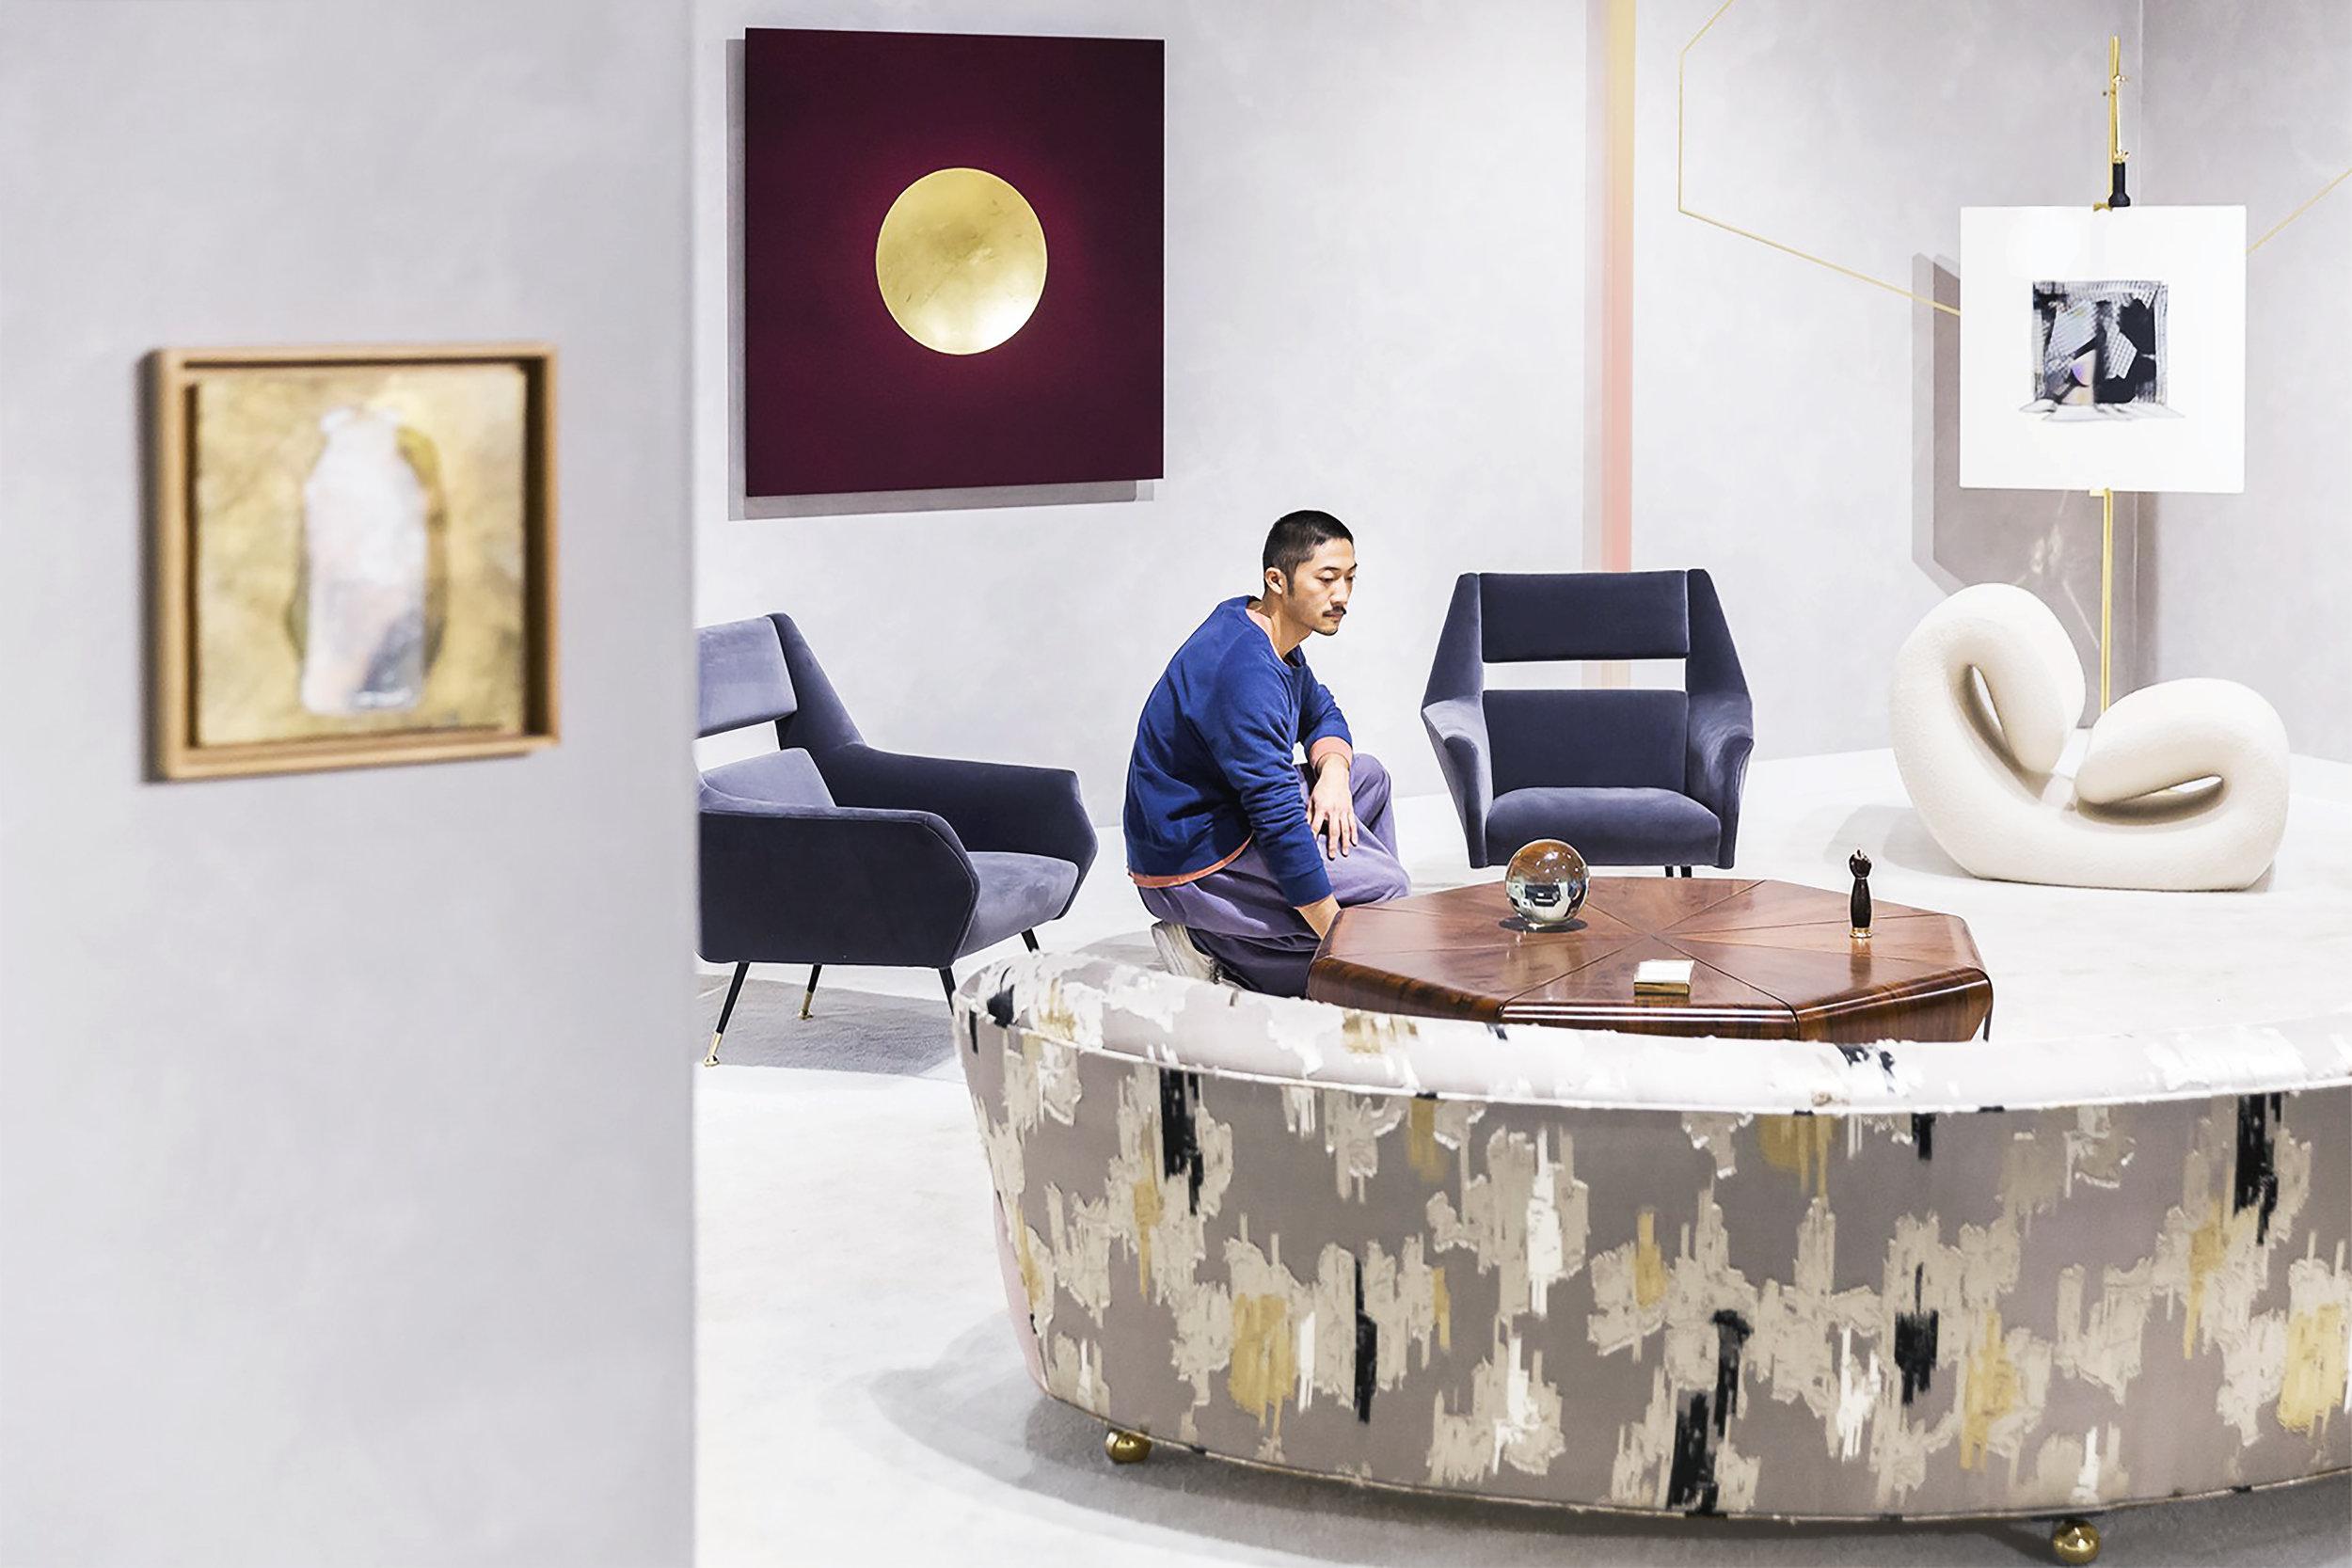 Collective Design New York 2018_Peter Blake Gallery_Installation View_15.jpg